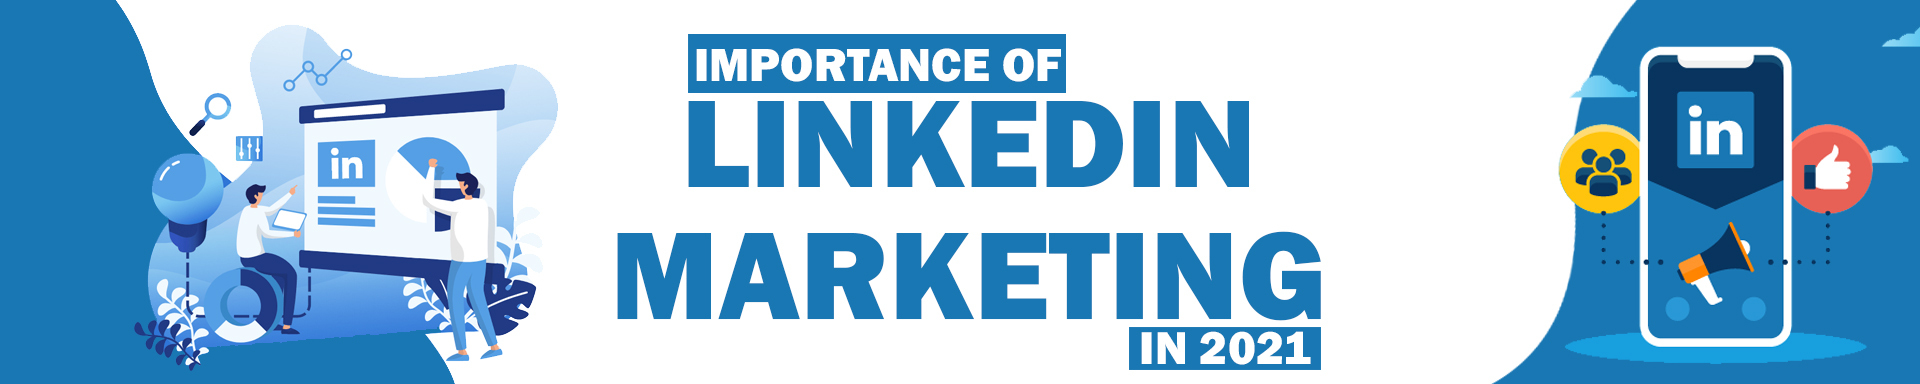 Importance of LinkedIn Marketing in 2021